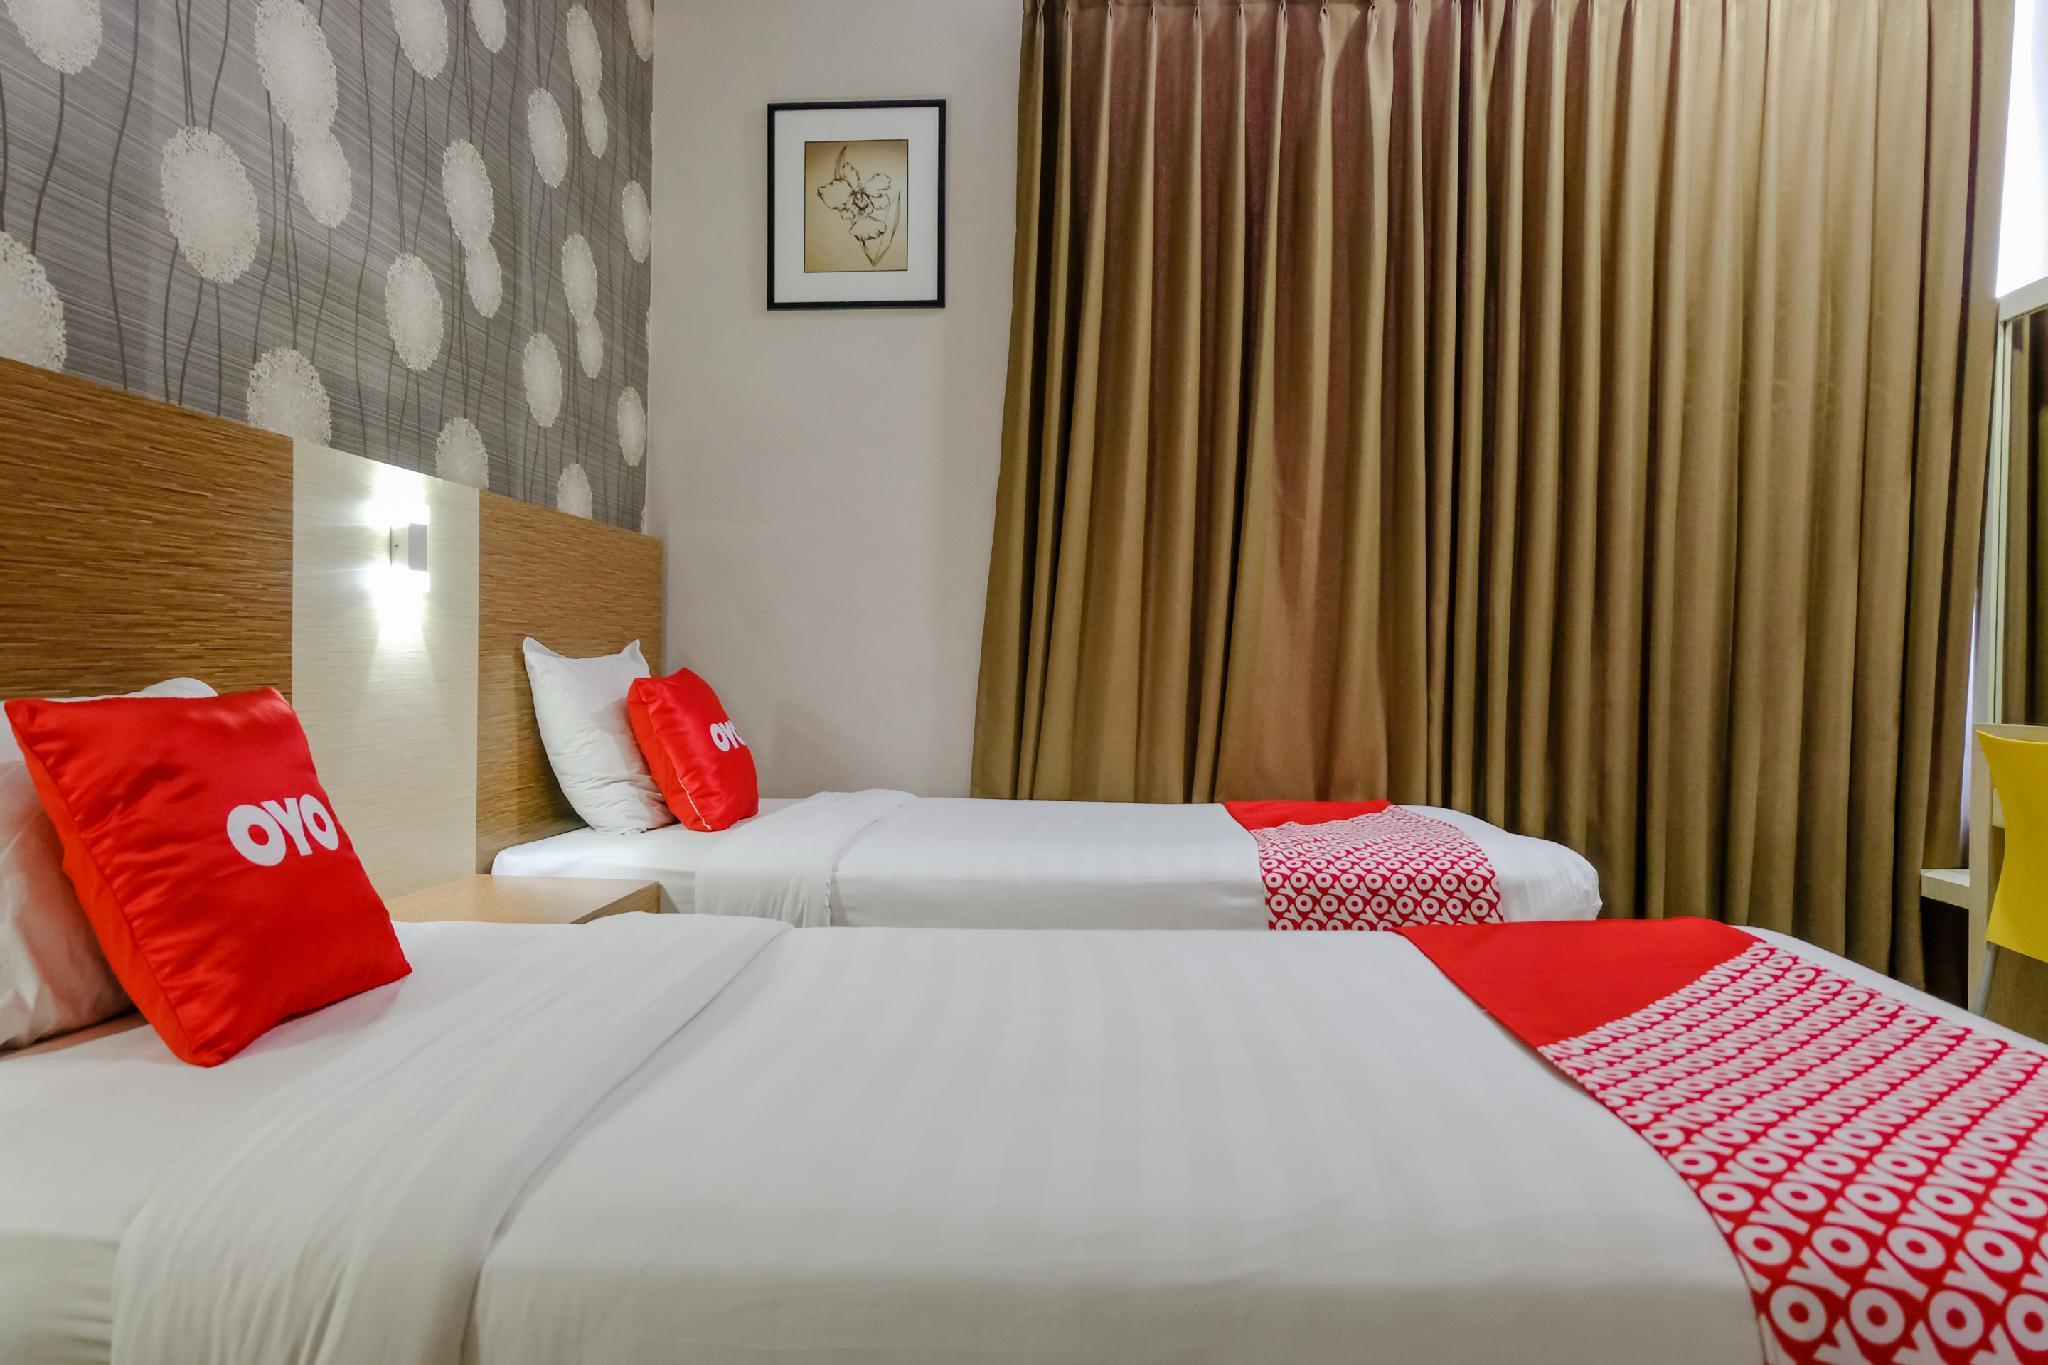 Cempaka Hill Hotel Jember Managed by Dafam